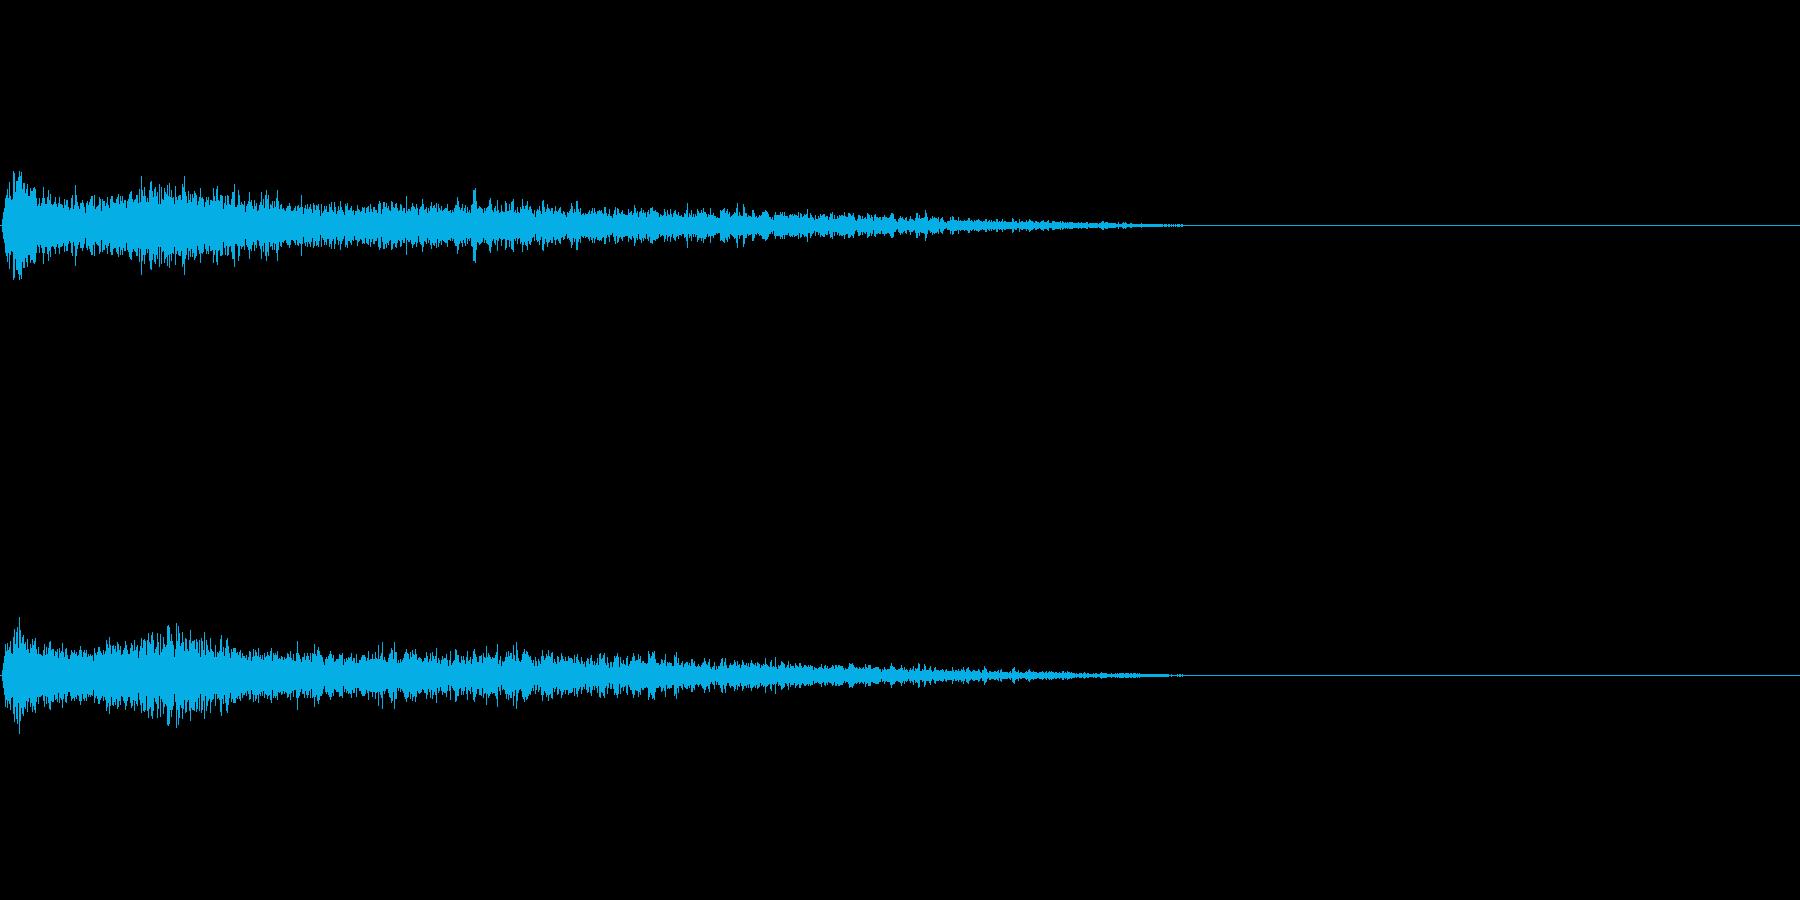 Dメジャー インパクト音 衝撃音の再生済みの波形